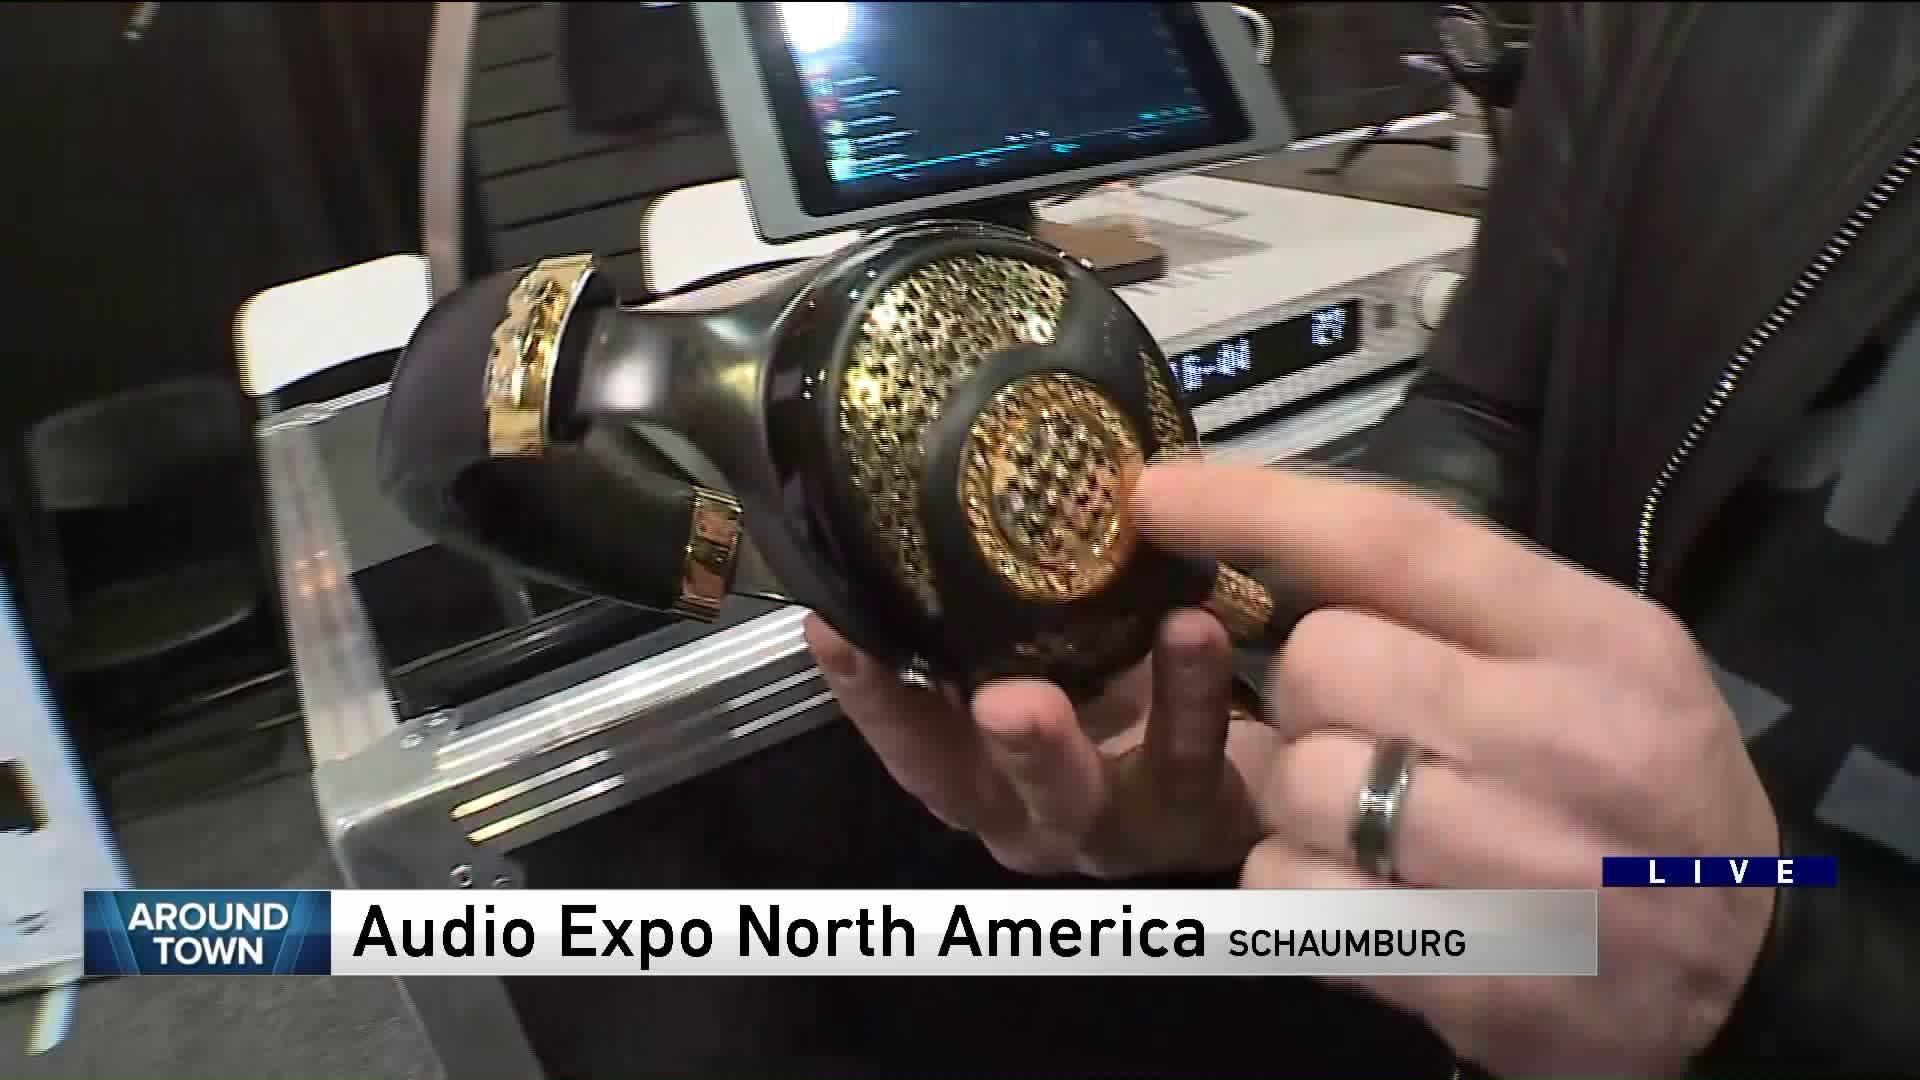 Around Town checks out AXPONA: Audio Expo North America